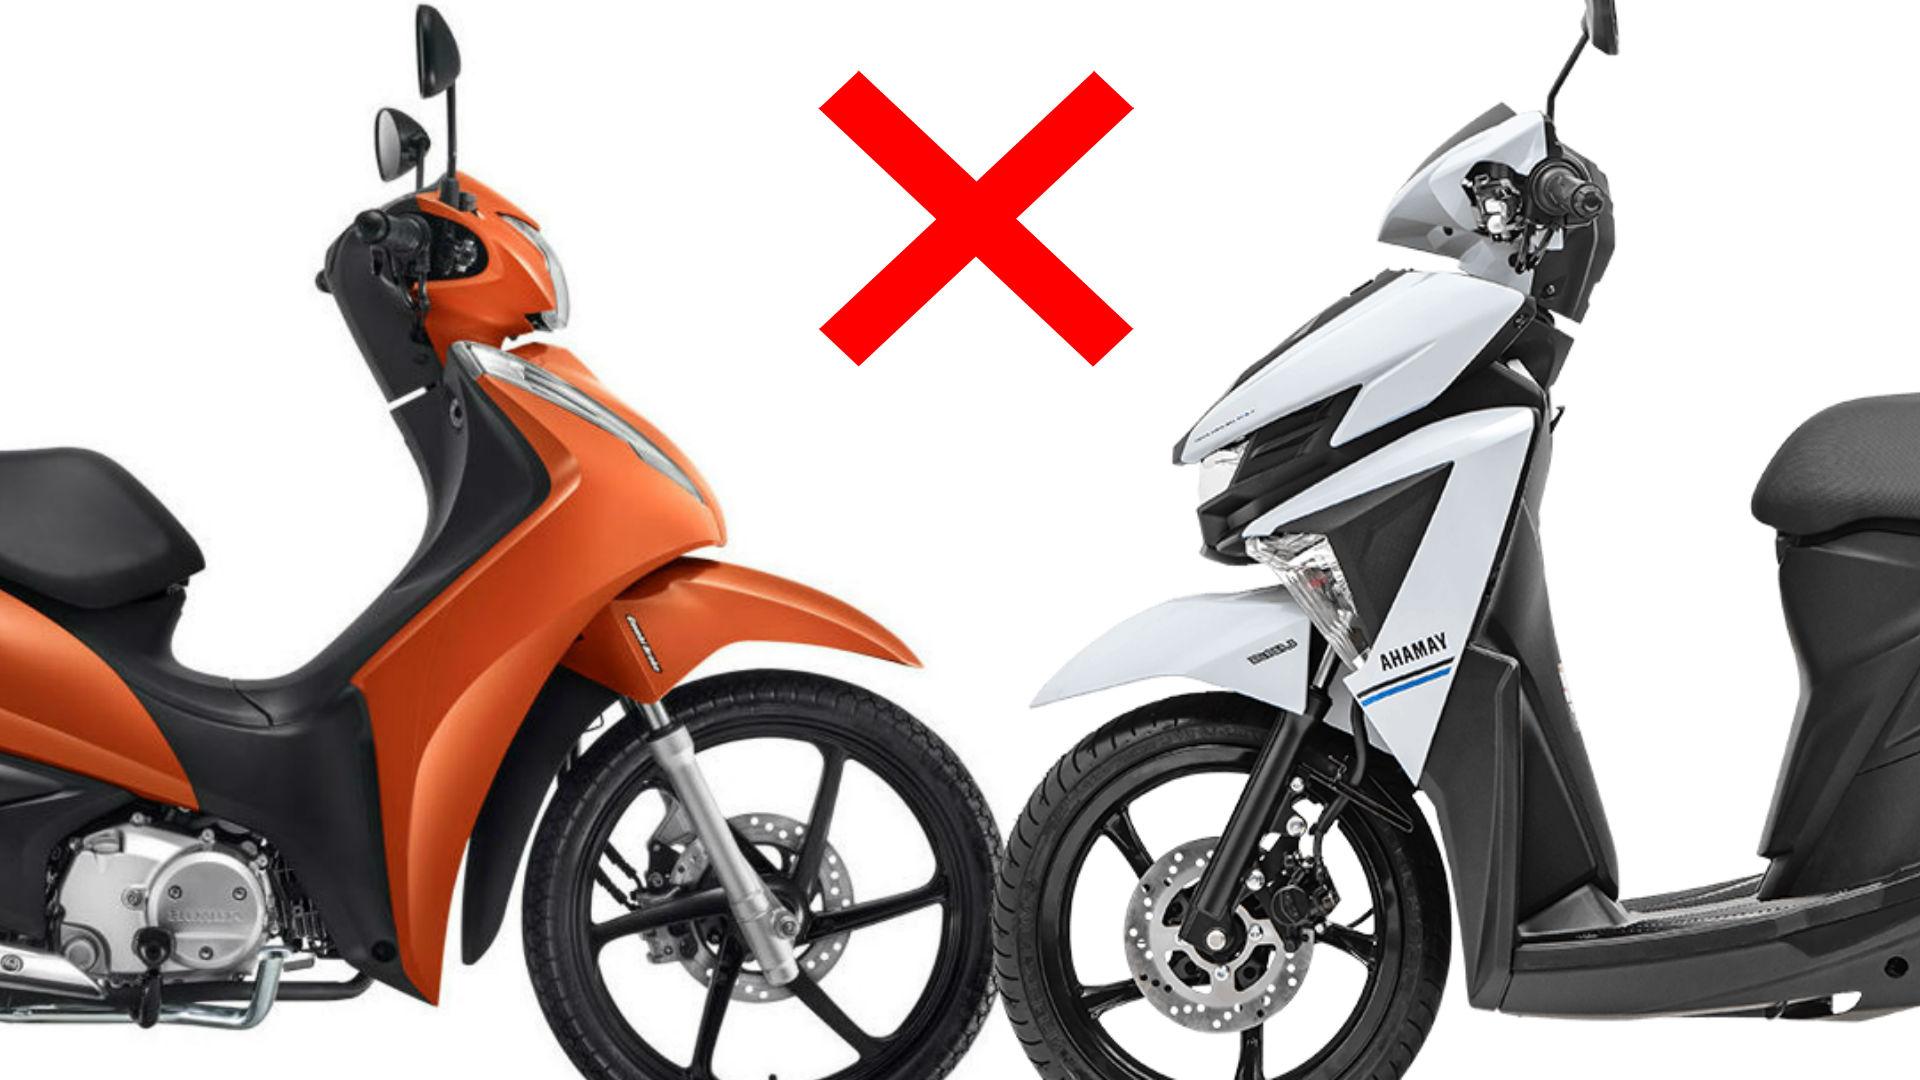 Será se agora a Honda Biz 125 2018 bate a Yamaha Neo 125? | MotoNews Brasil